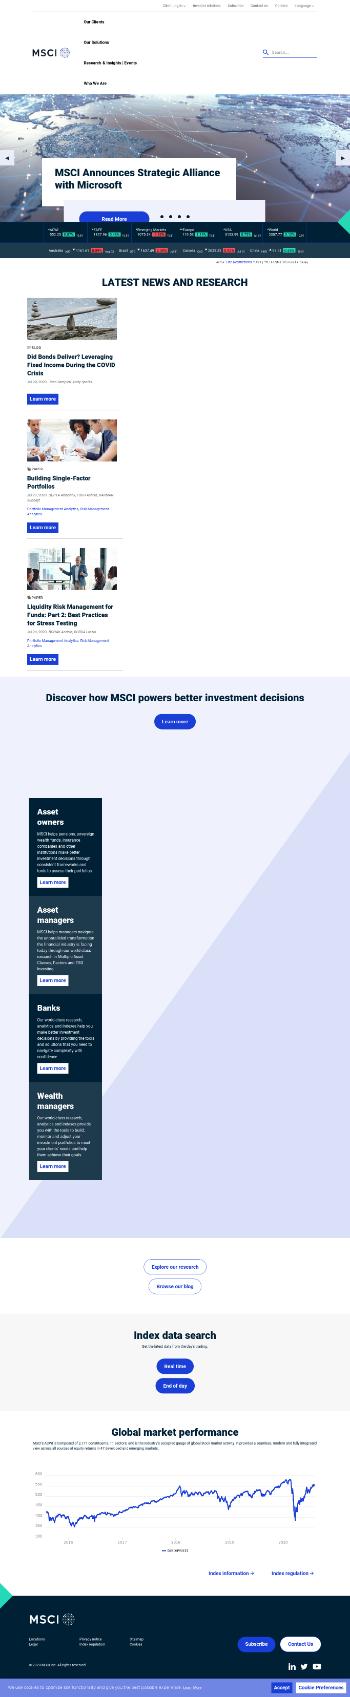 MSCI Inc. Website Screenshot